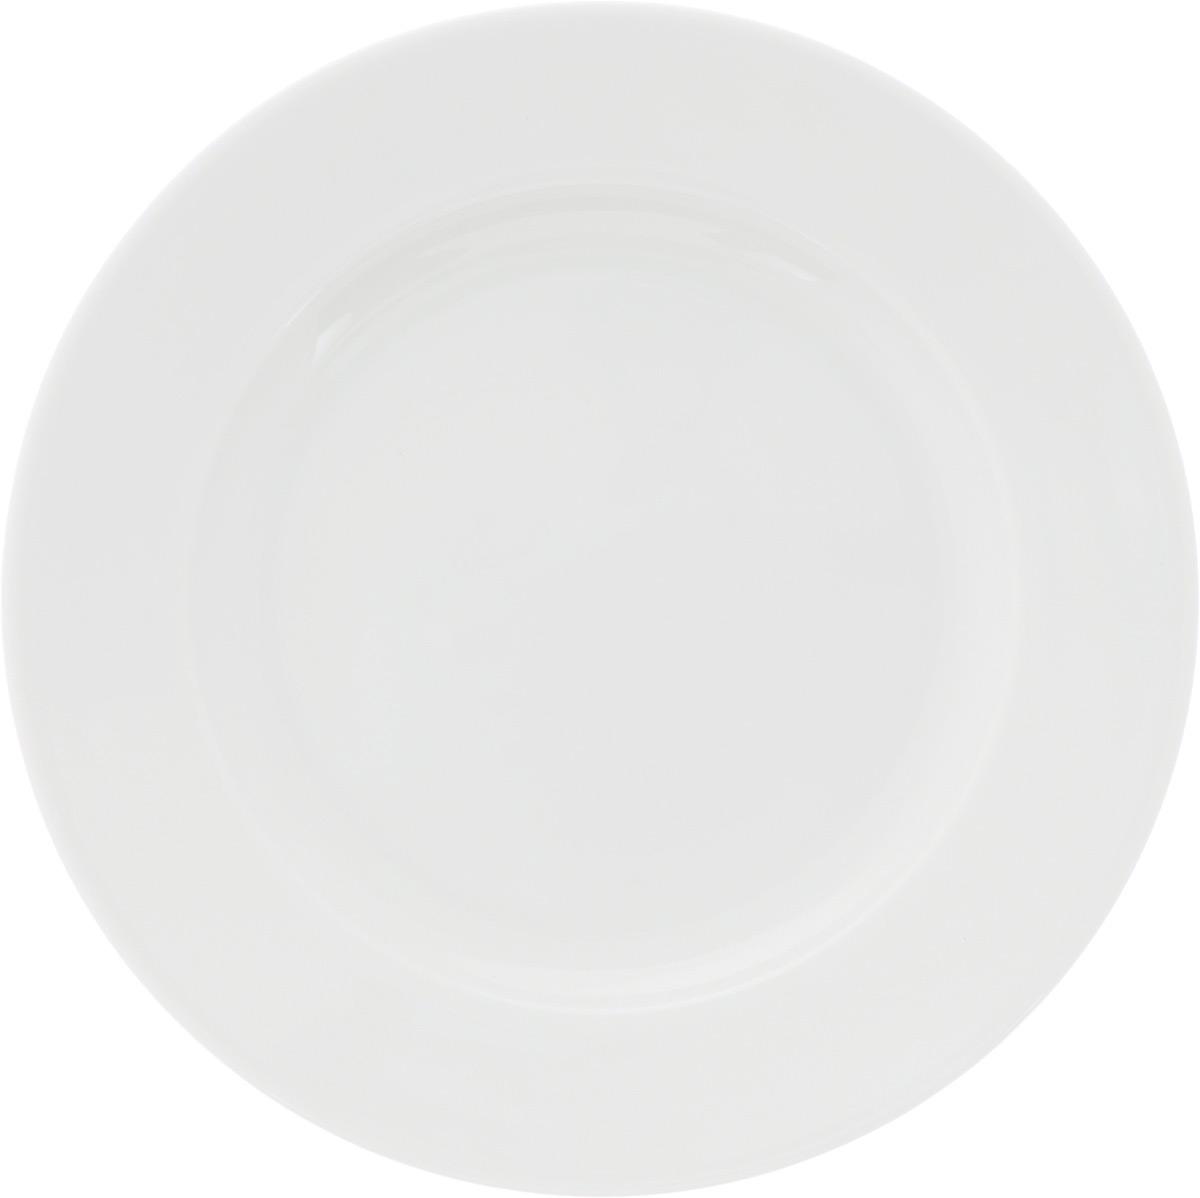 Тарелка мелкая Ariane Прайм, диаметр 17 см